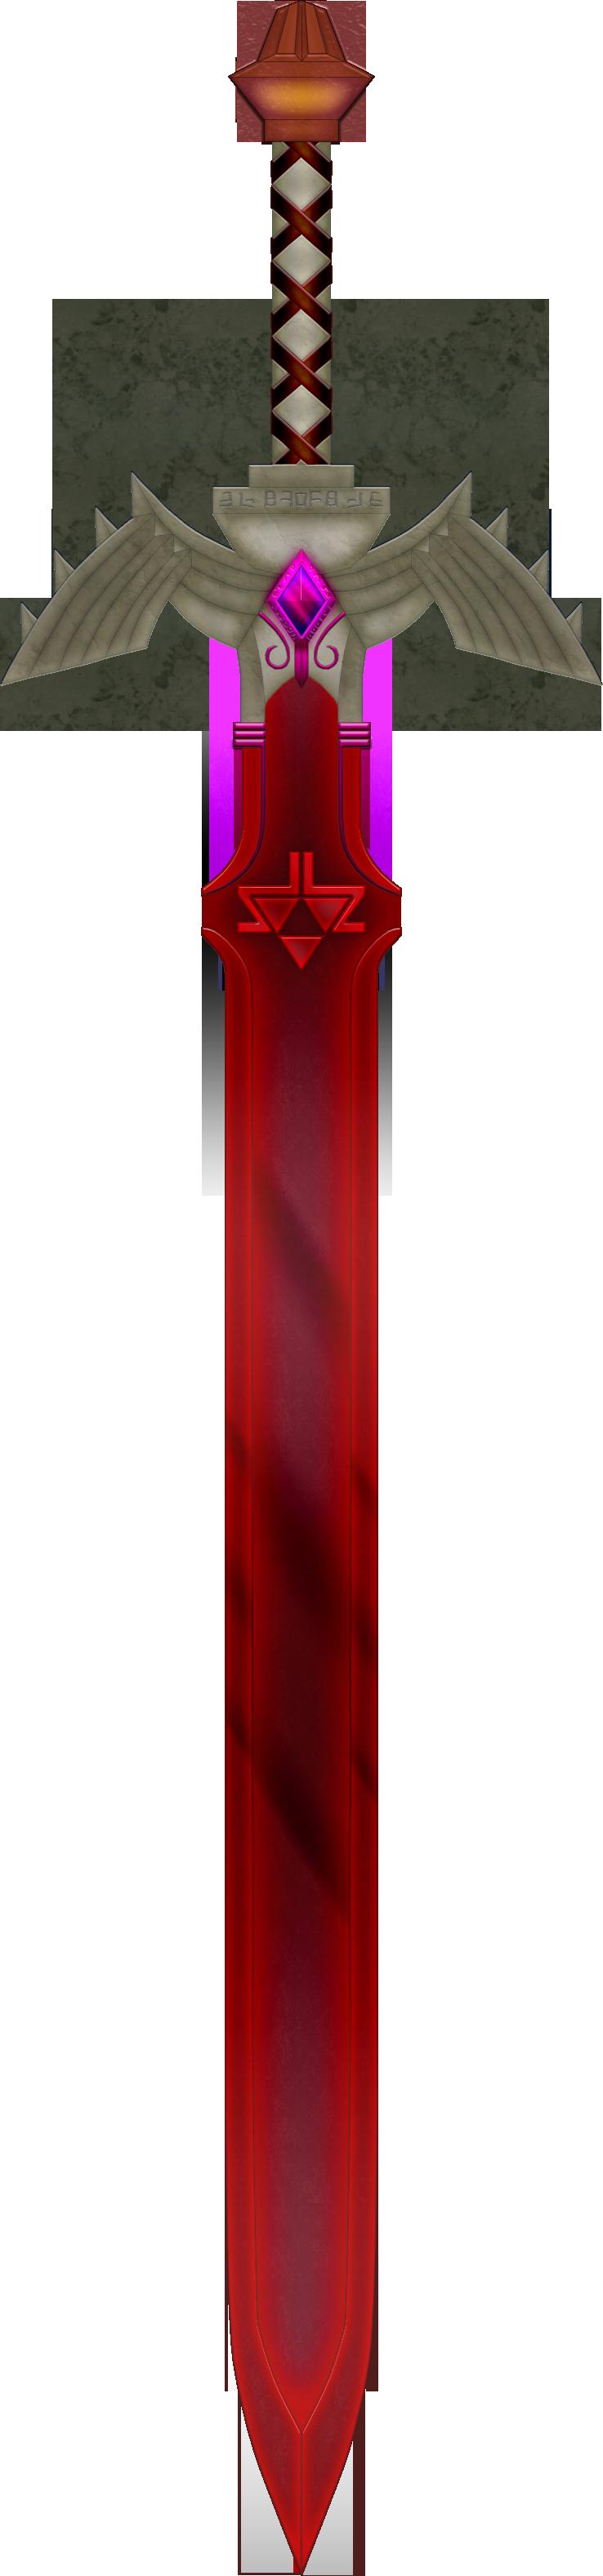 Dark Master Sword By Blueamnesiac On Deviantart Master Sword Legend Of Zelda Sword